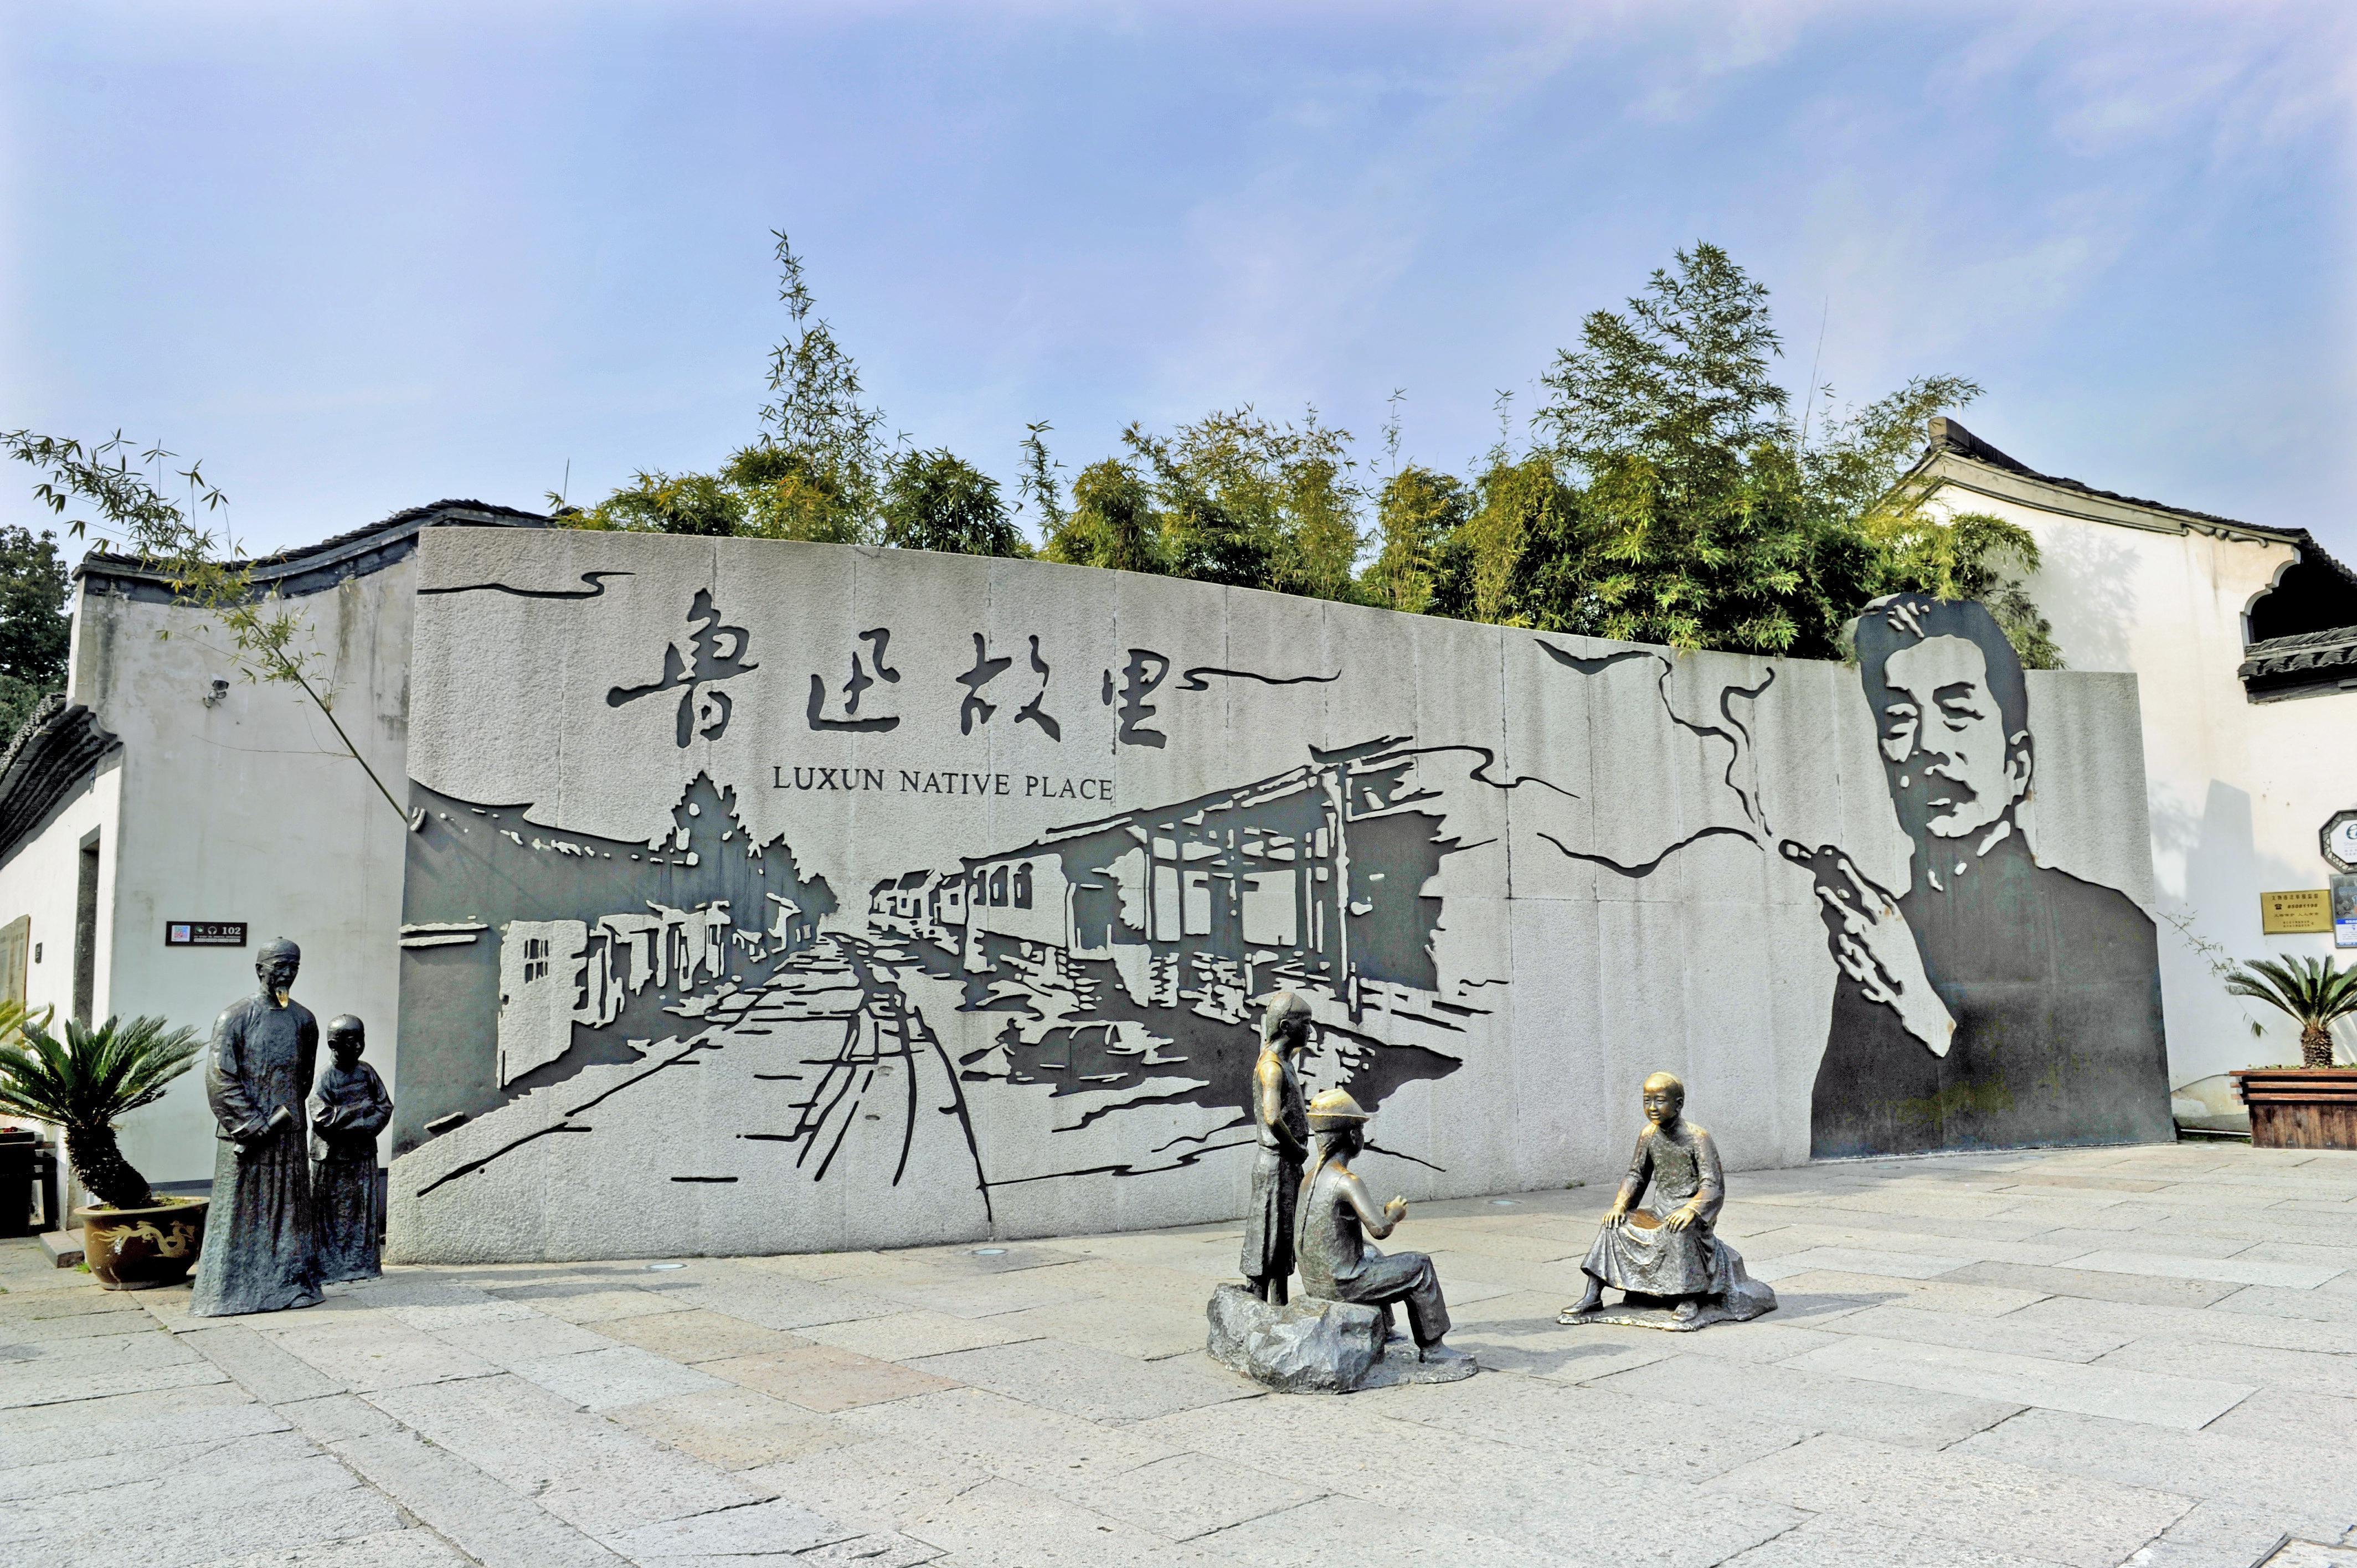 Lu Xun Native Place